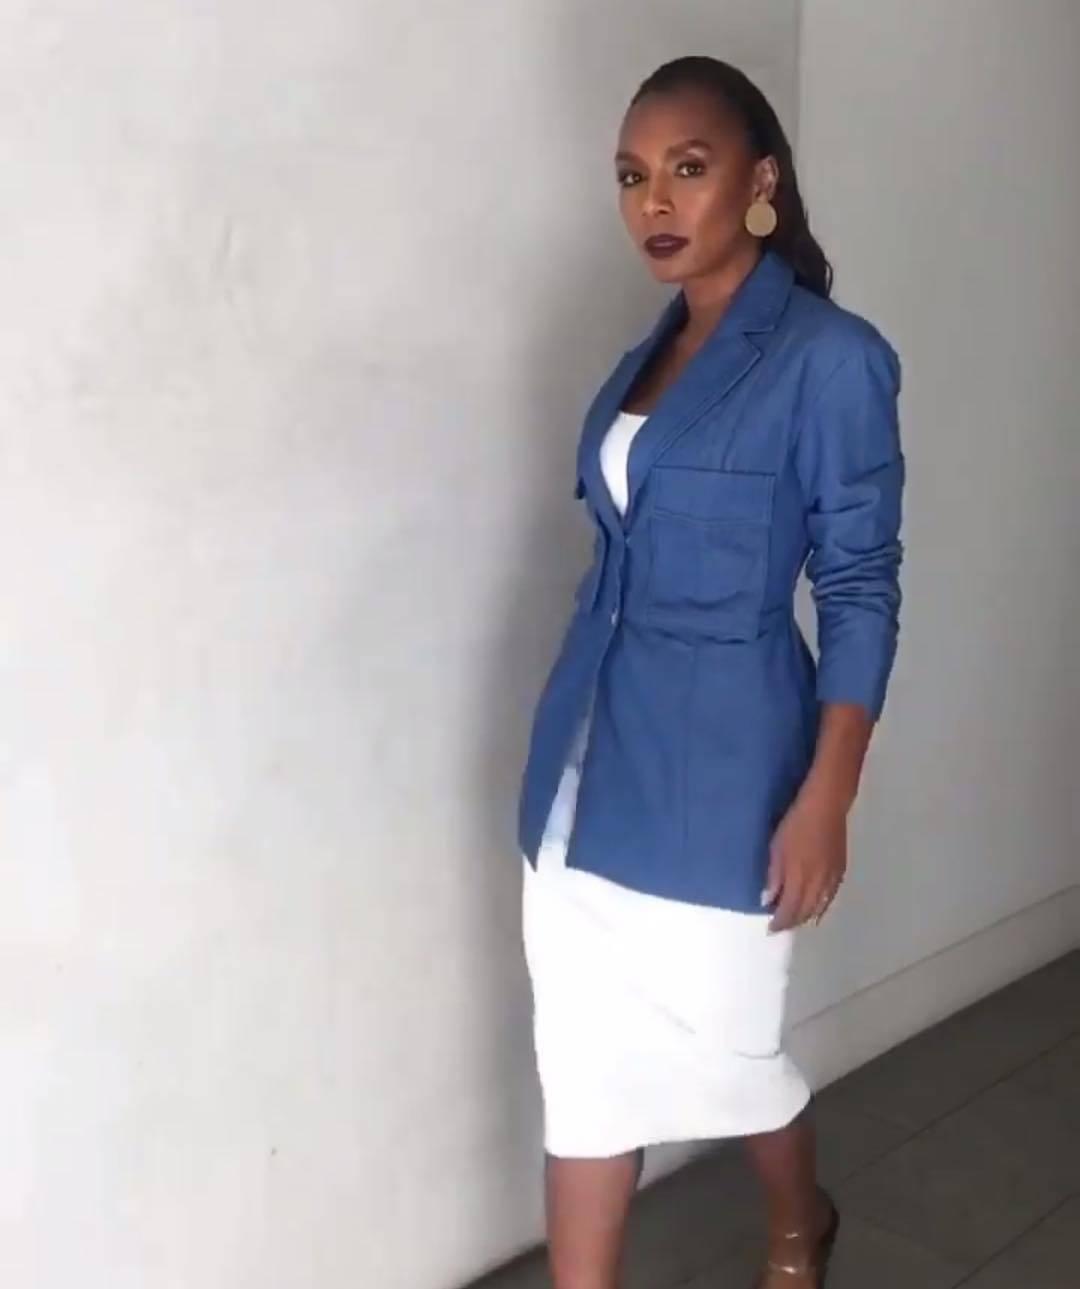 Women's Blazers 2020: Stylish Trends and Tendencies of Female Blazer